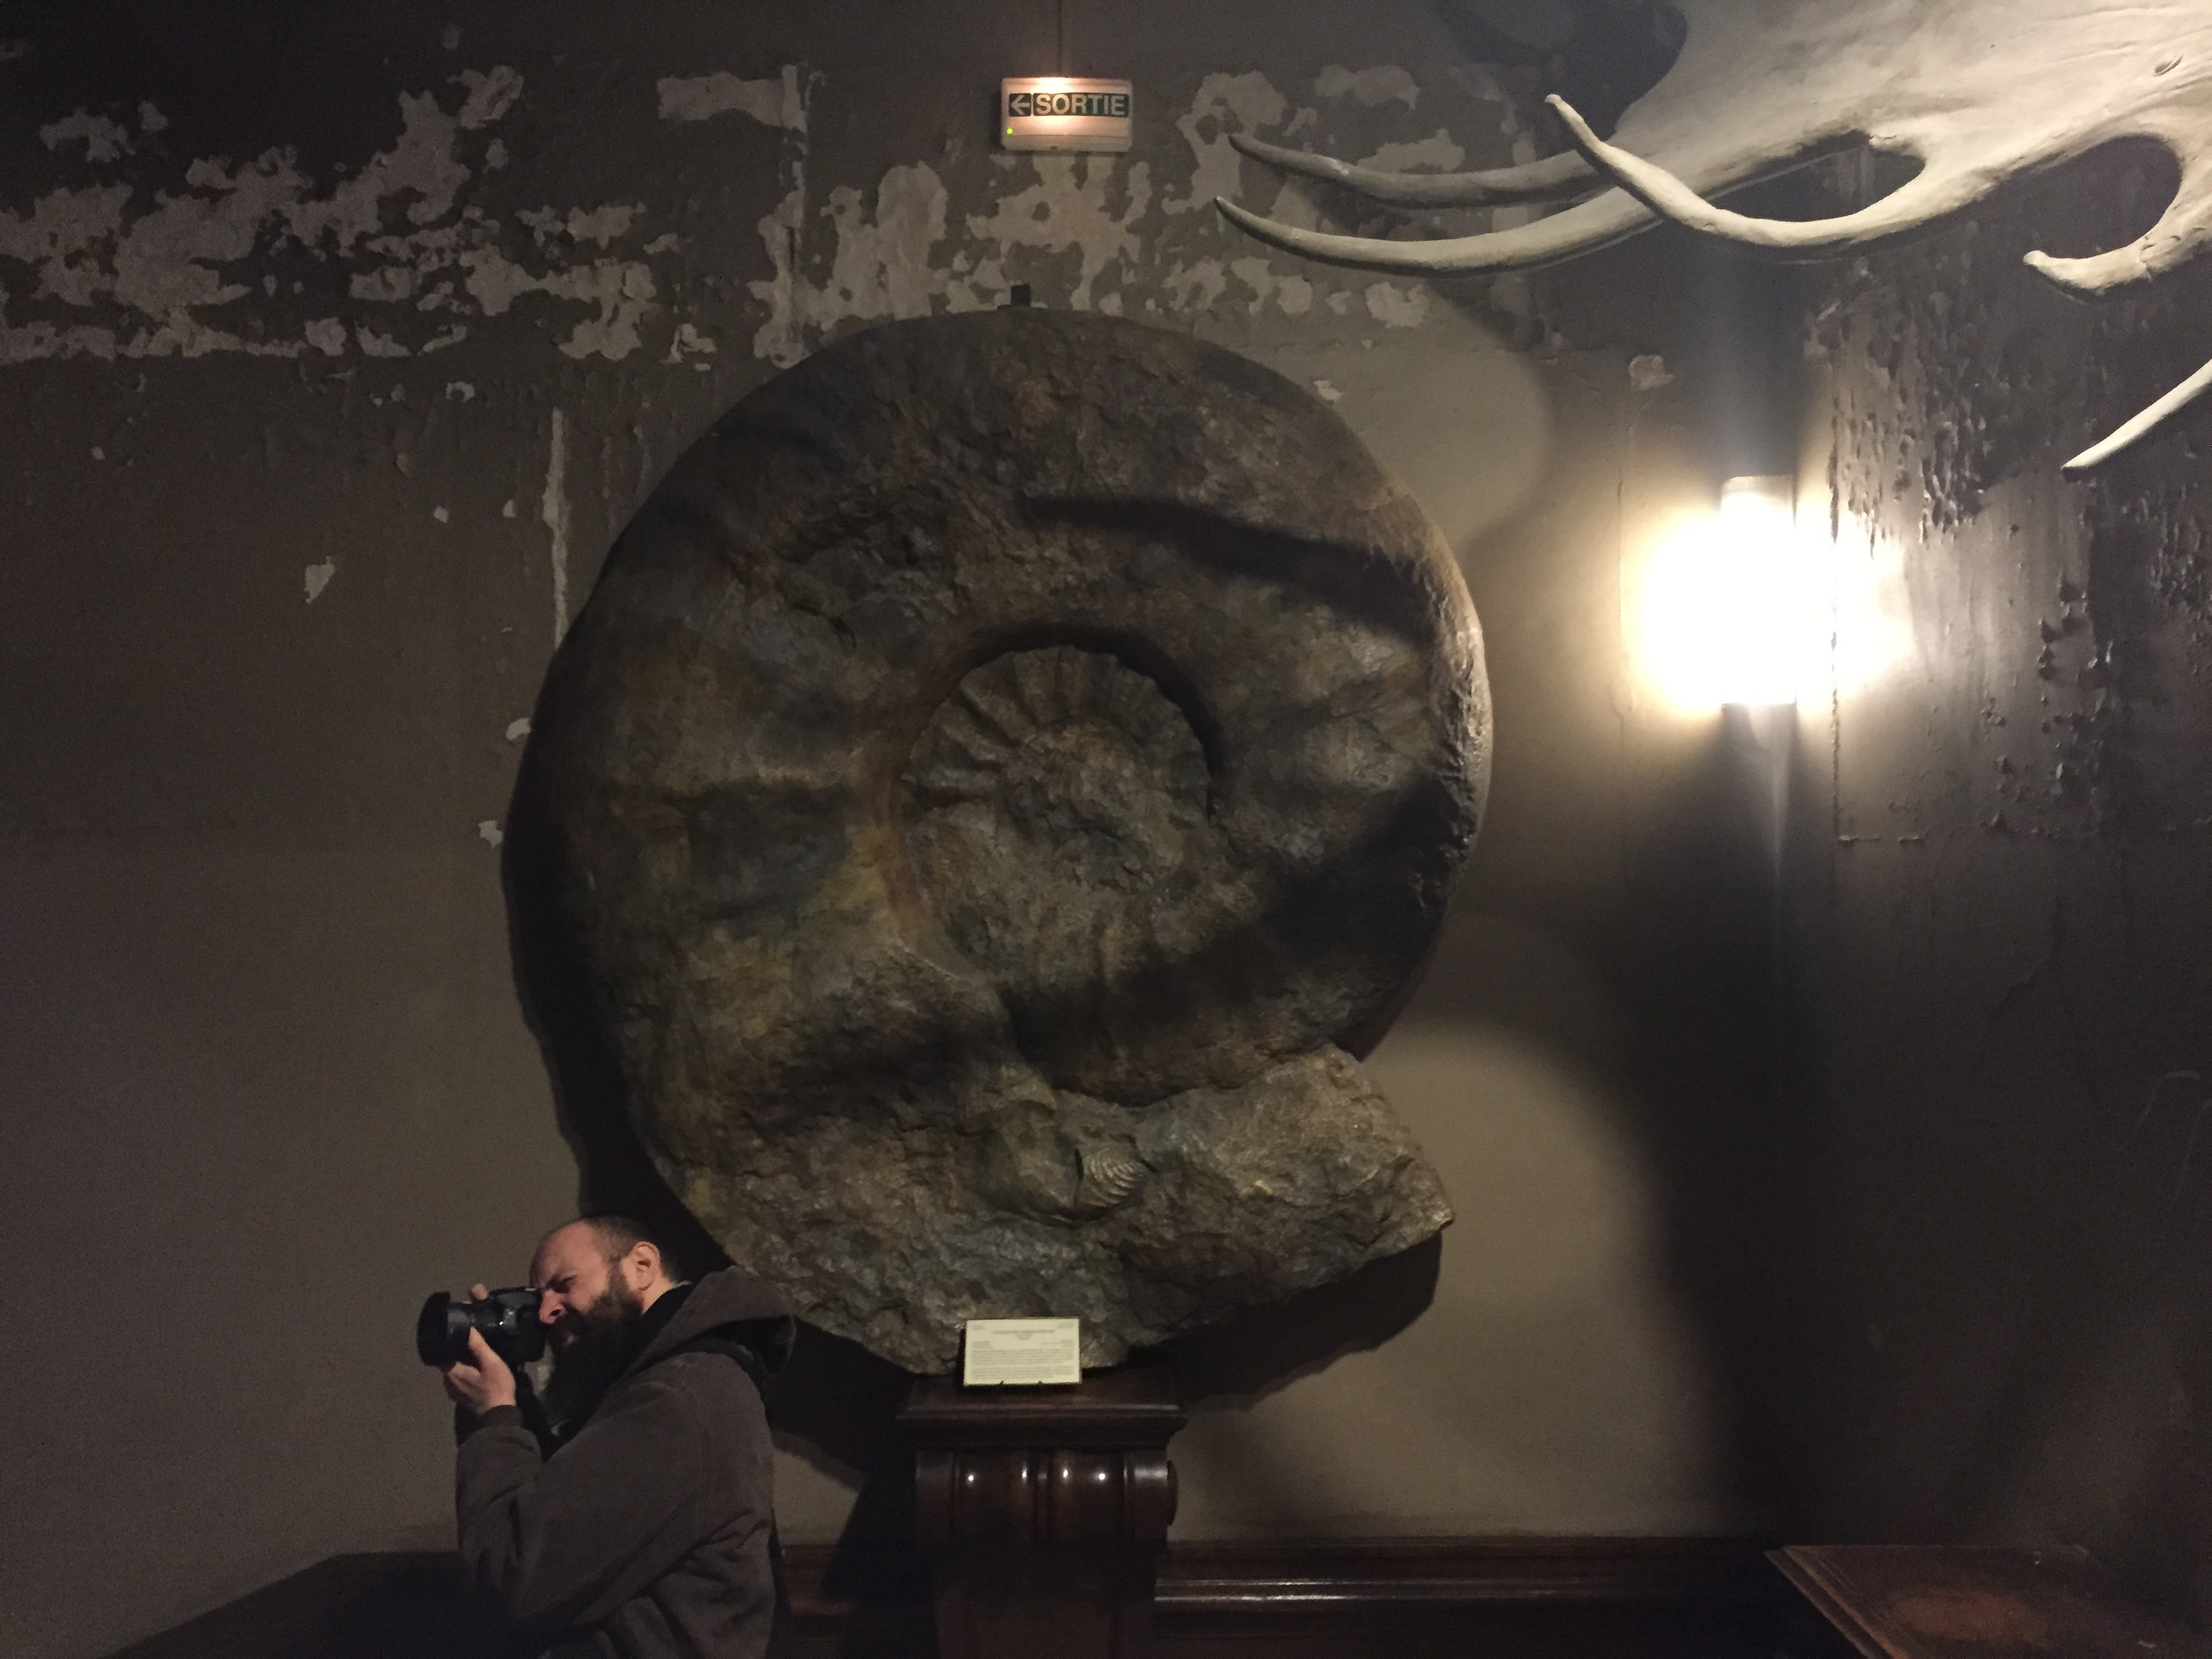 Gigantischer Ammonit in der Galerie de Paléontologie et d'Anatomie Comparée.